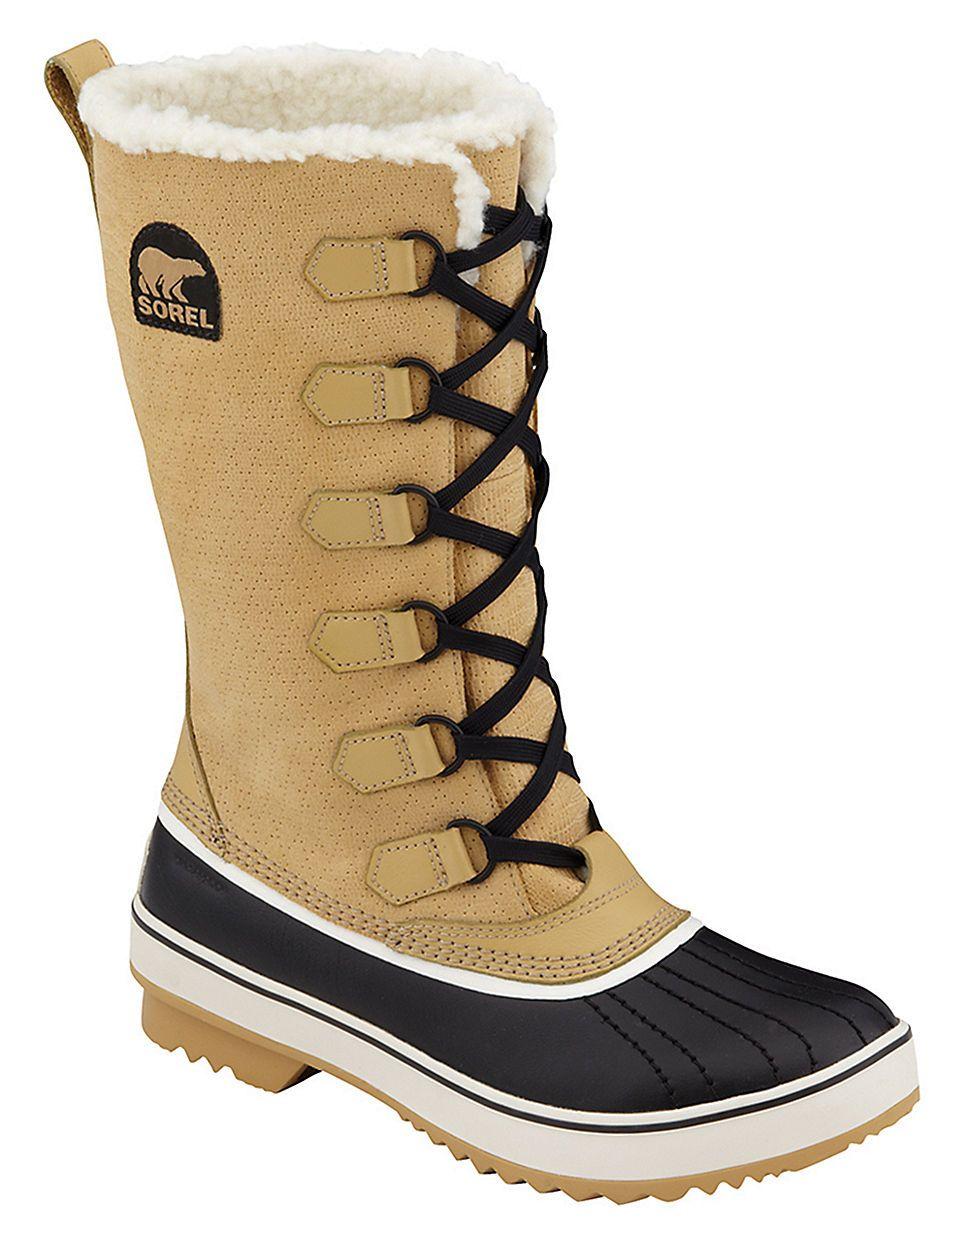 Shoes   Winter Boots   Women's Tivoli